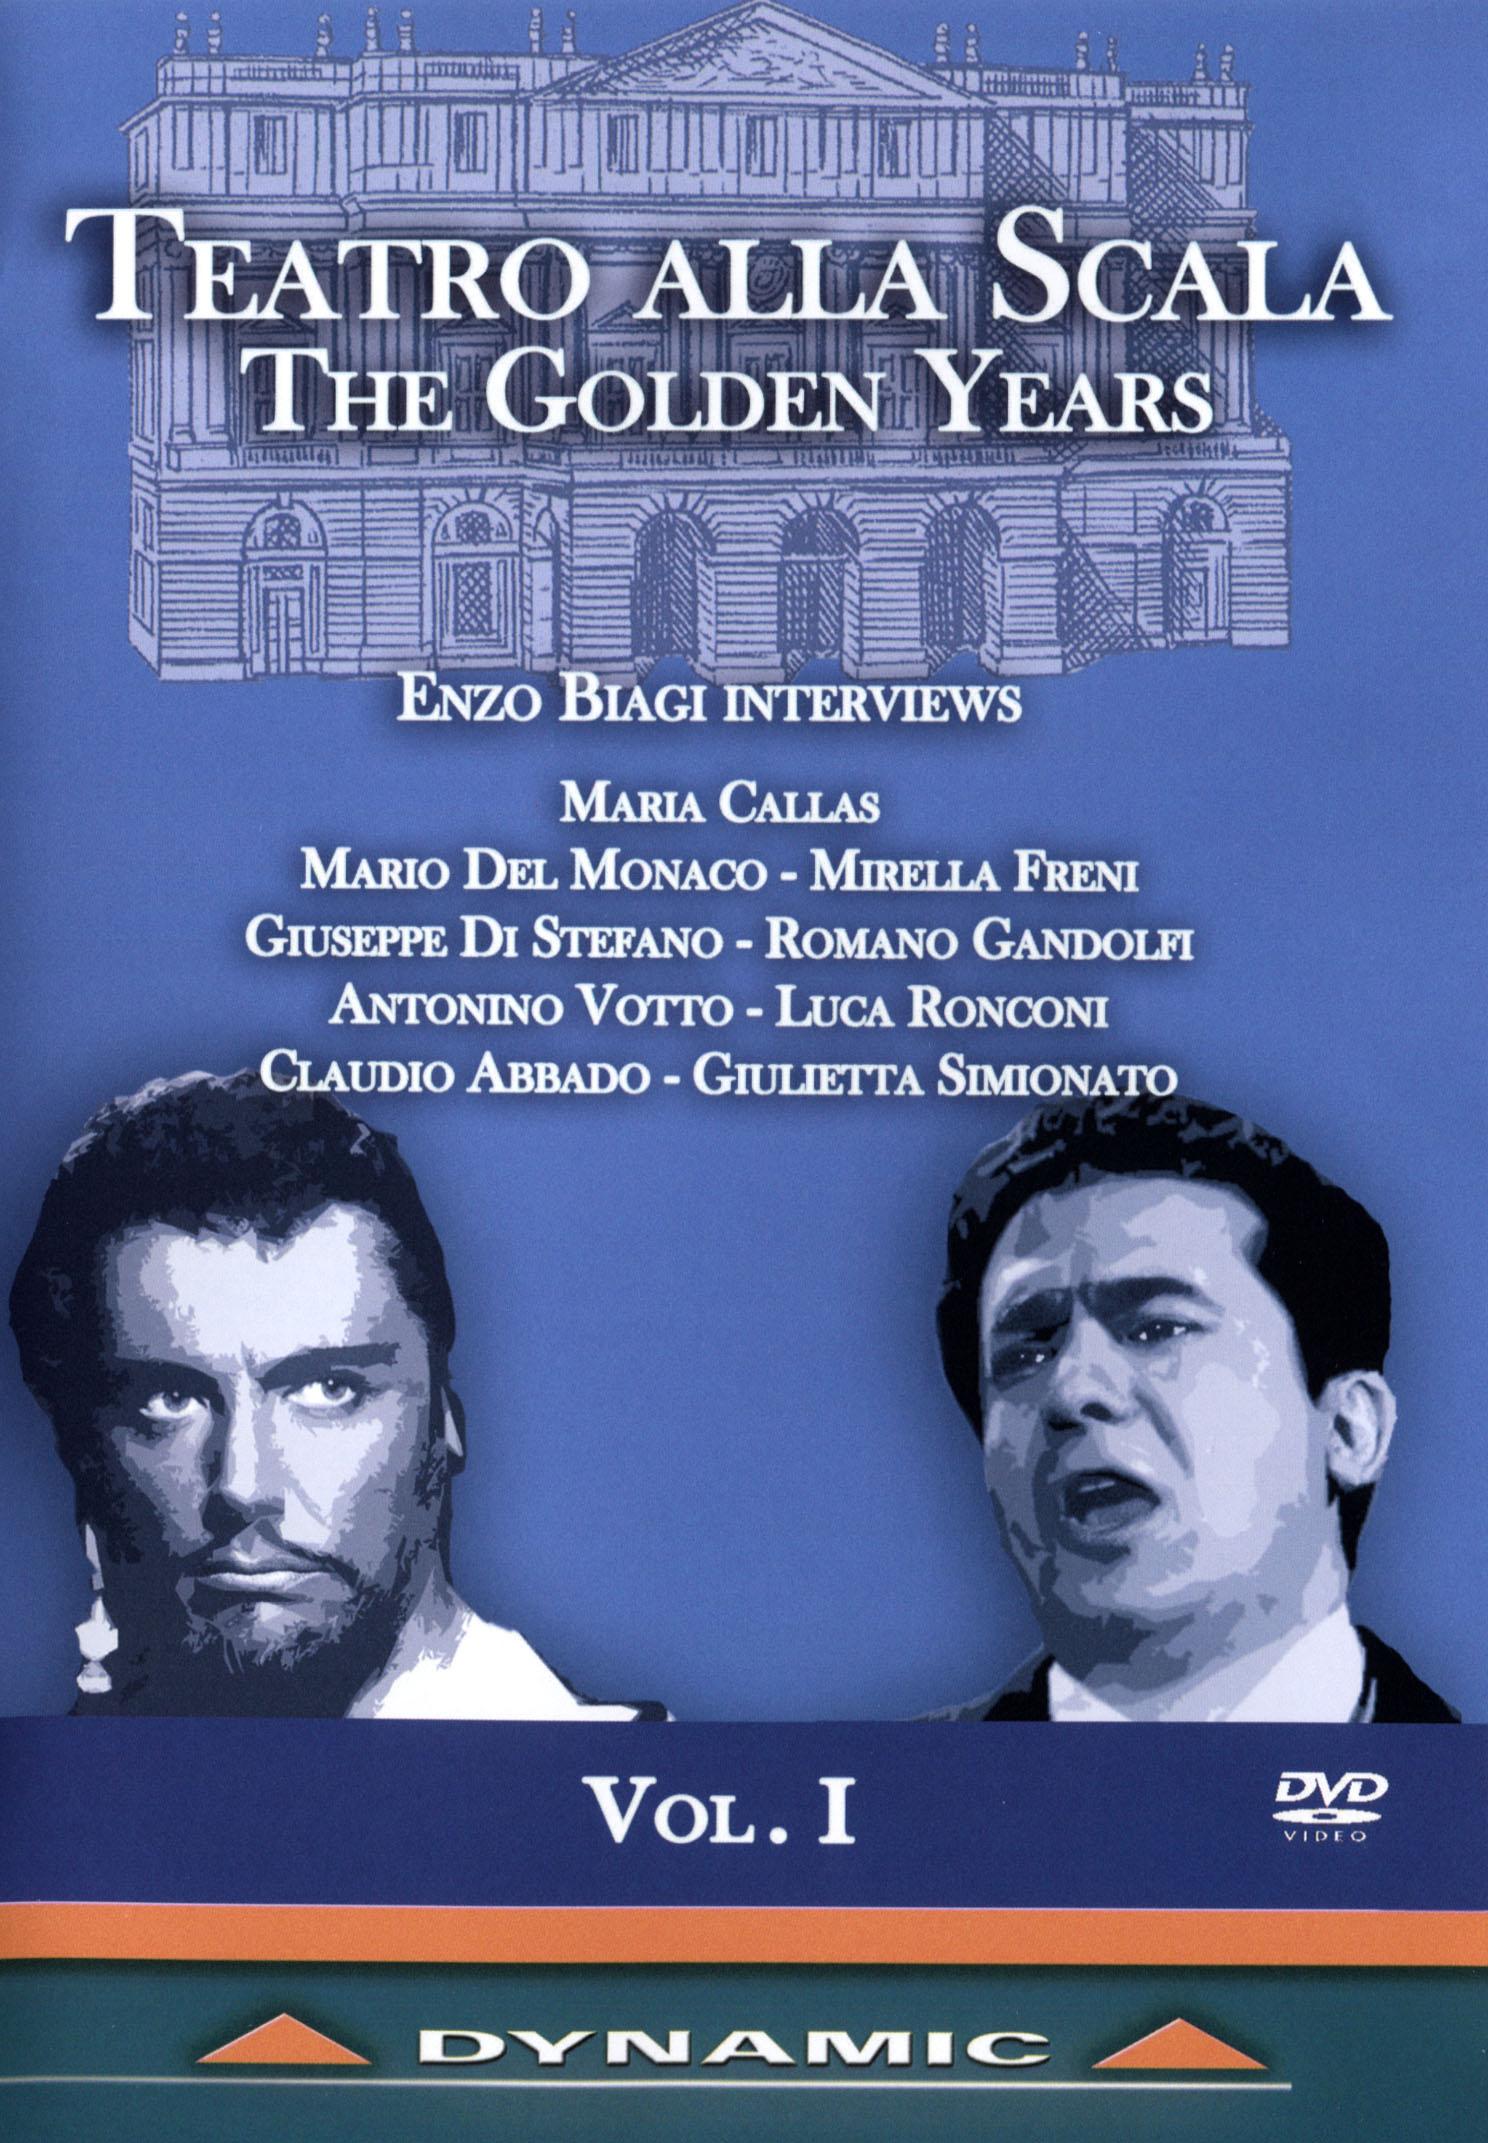 Teatro Alla Scala: The Golden Years - Vol. I